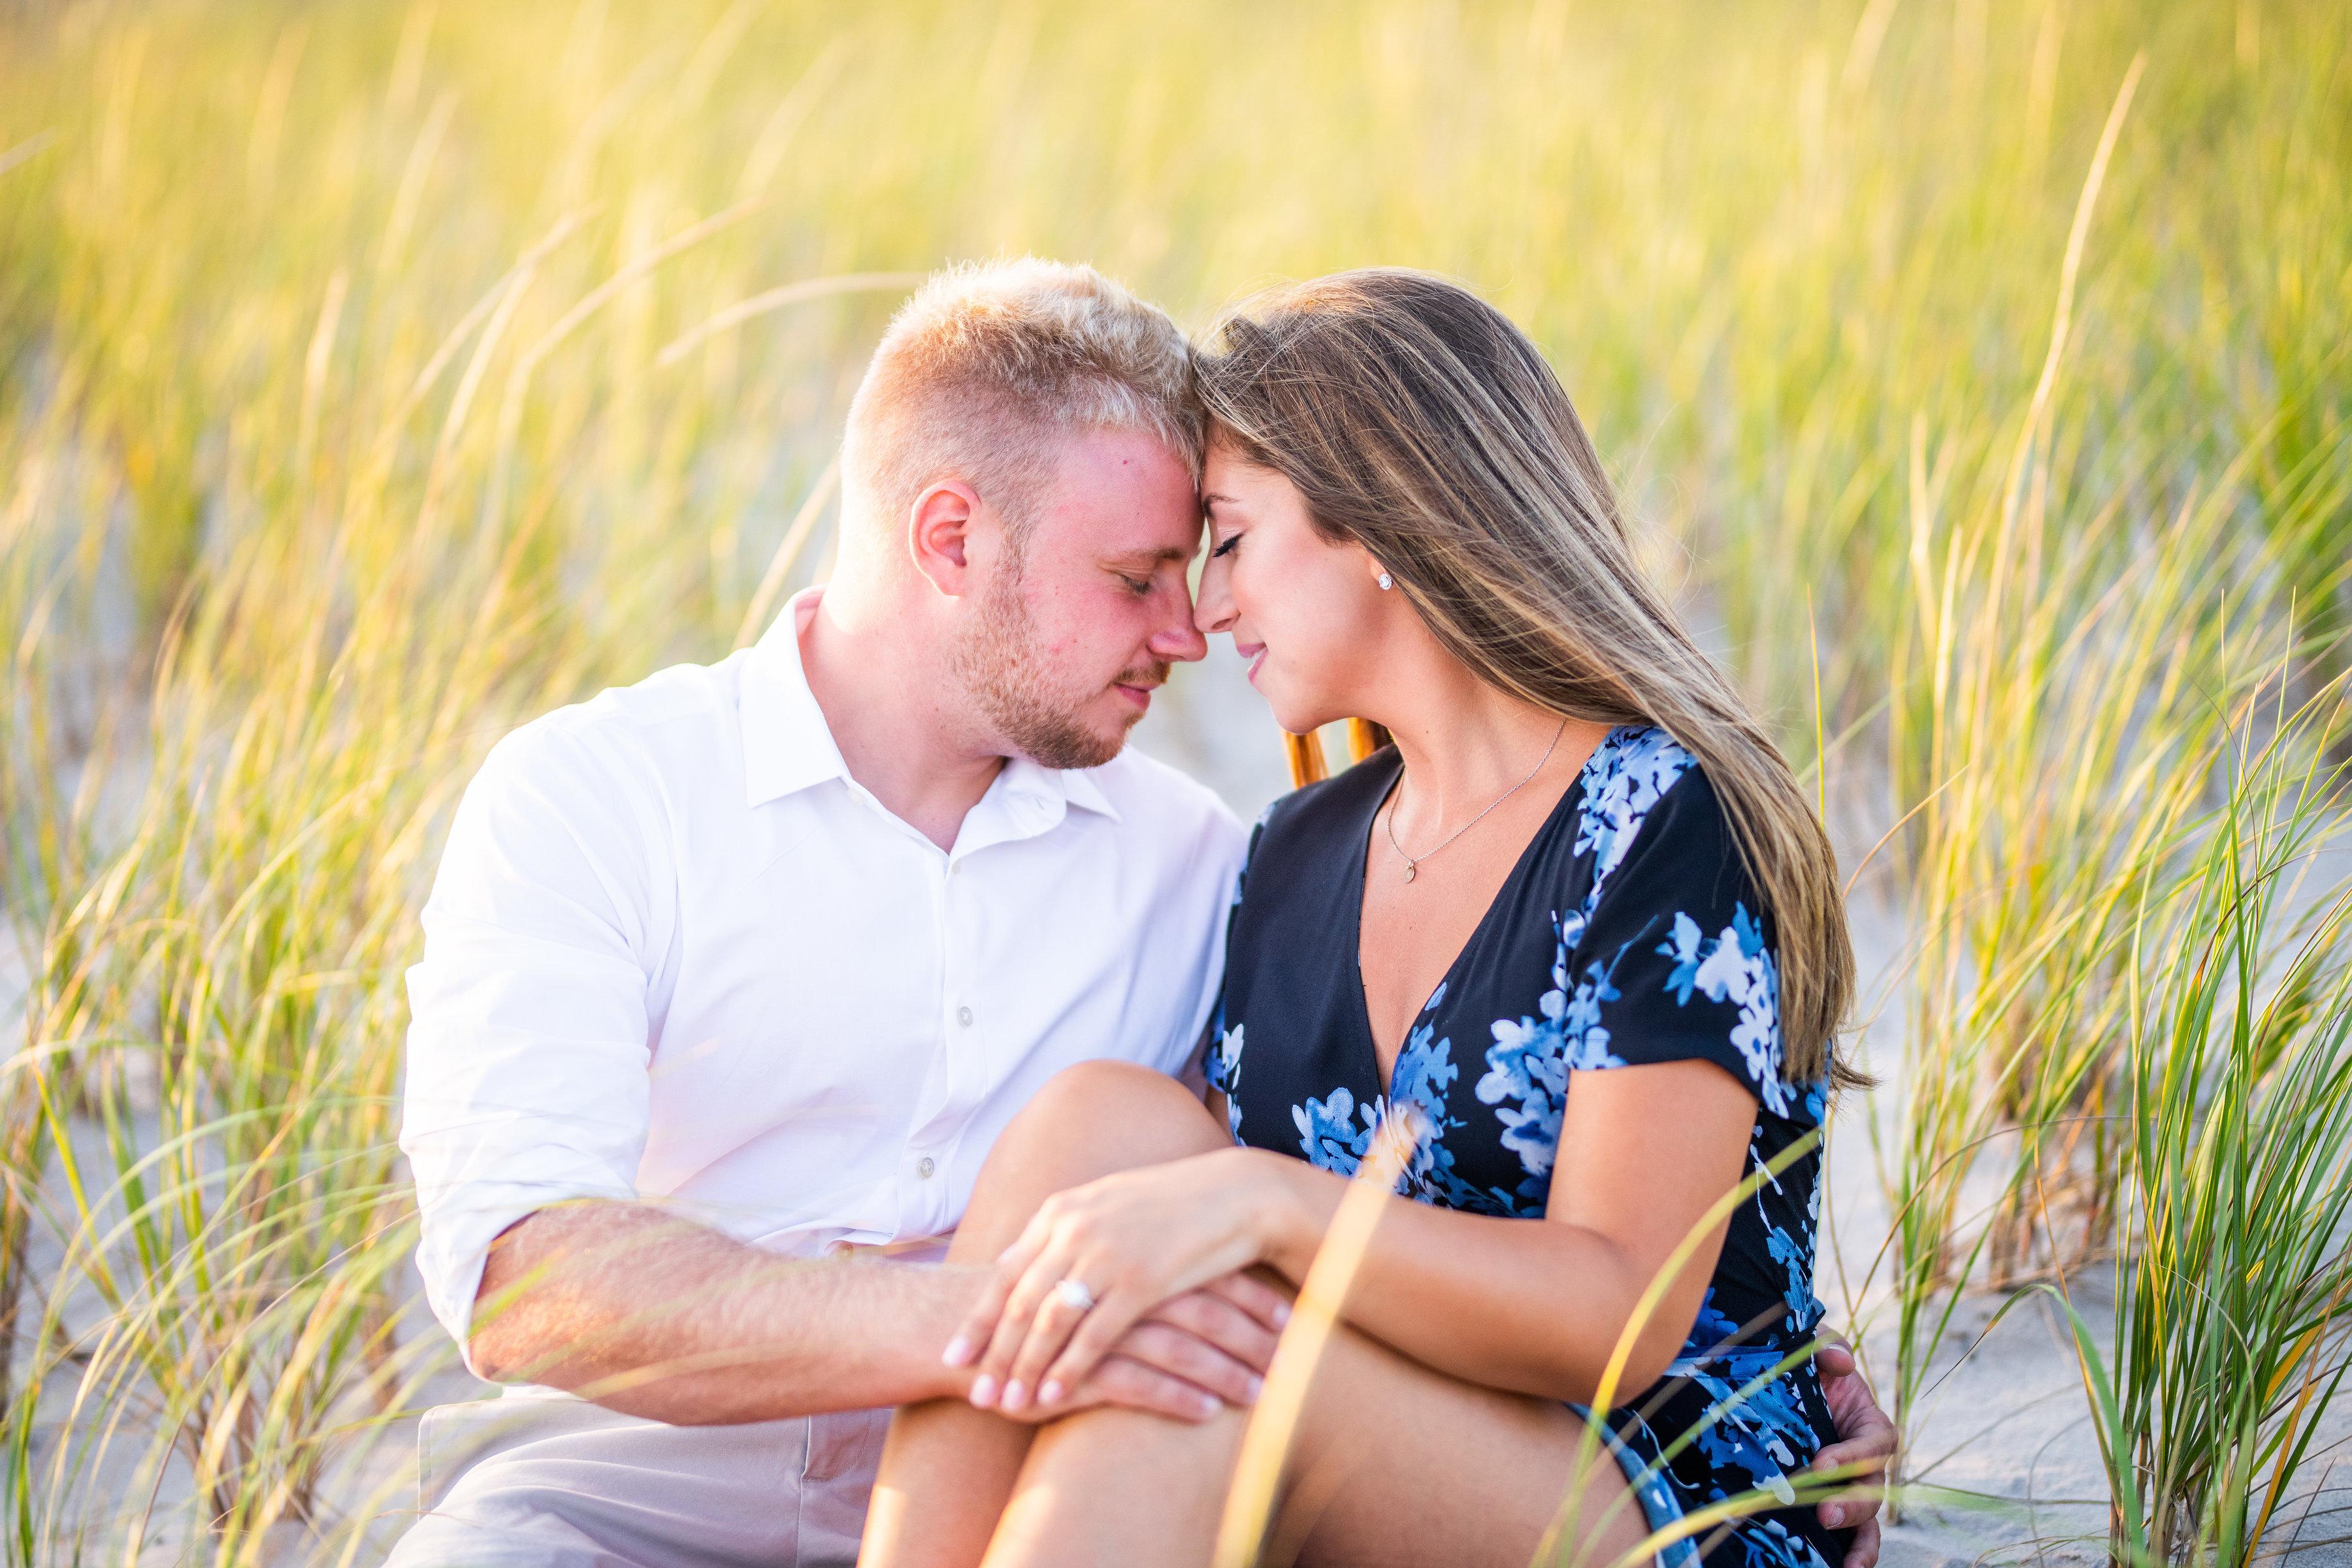 Dune Road Engagement Shoot | Westhampton Beach Engagement Shoot | Hamptons Wedding Photographer9